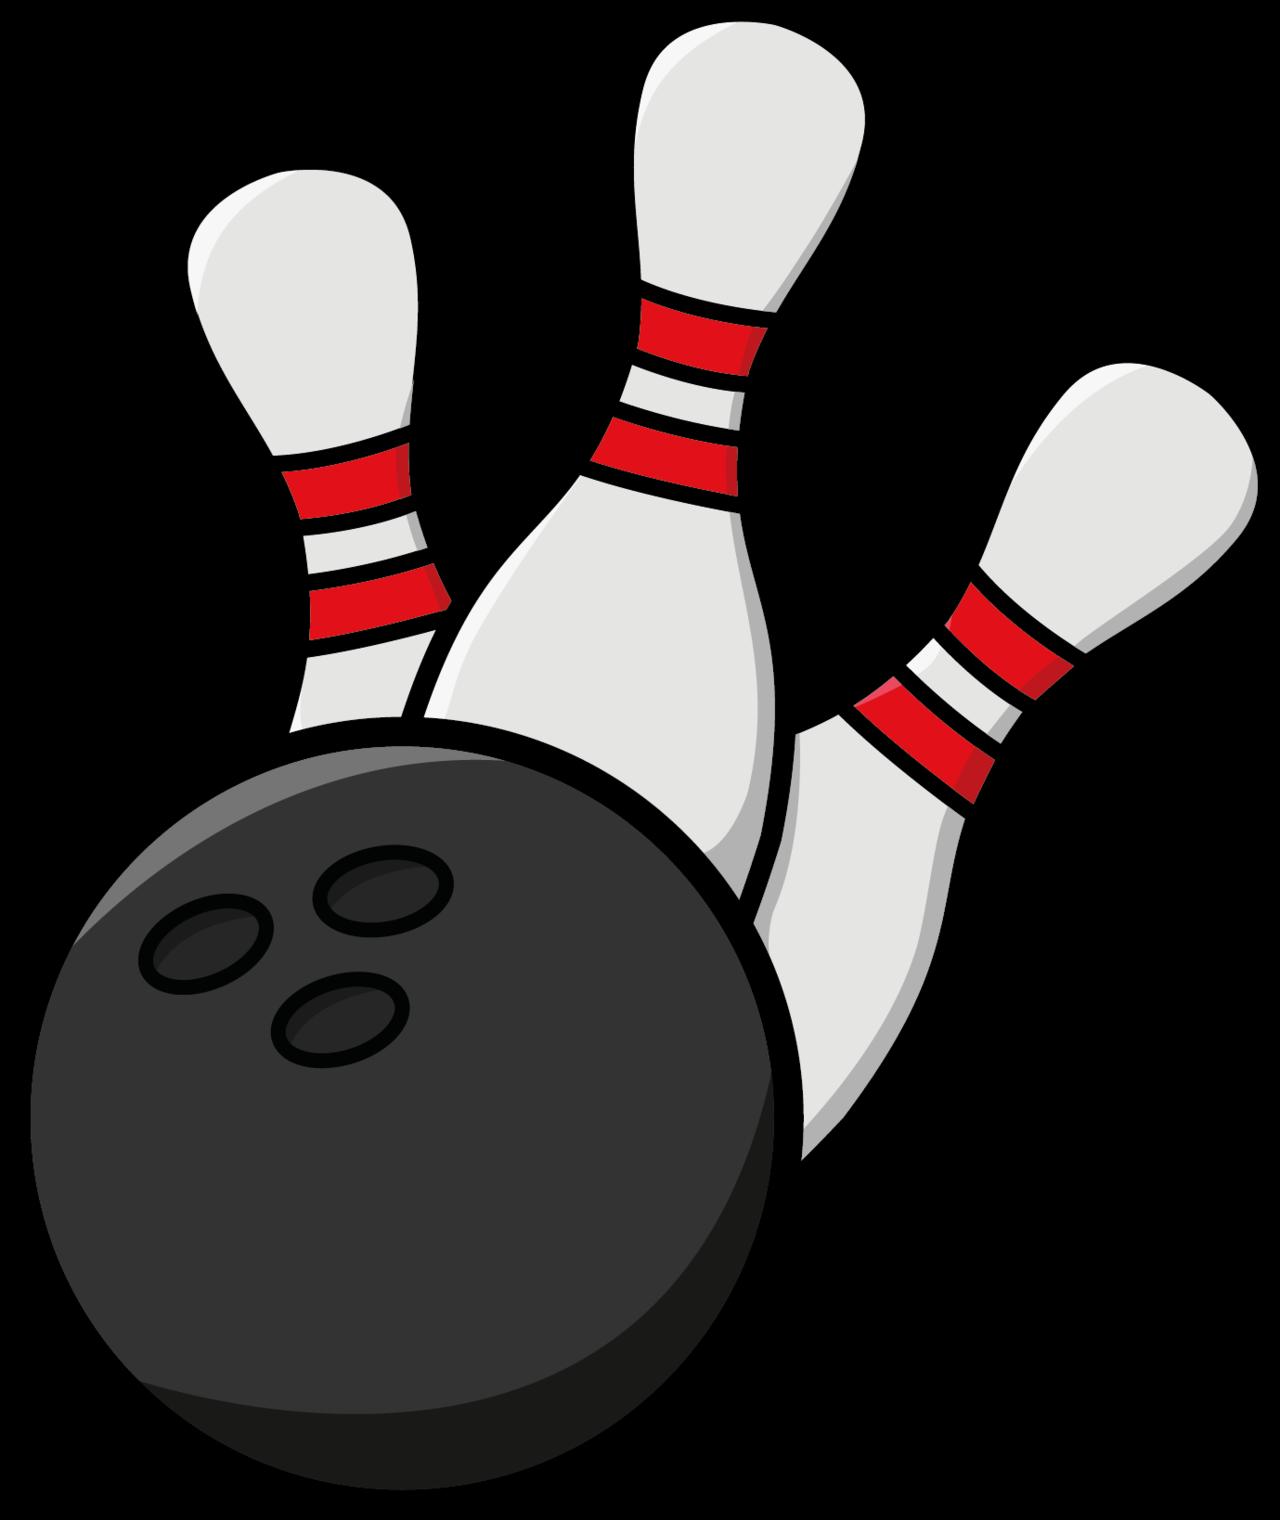 Holiday clipart bowling. Christmas clip art real